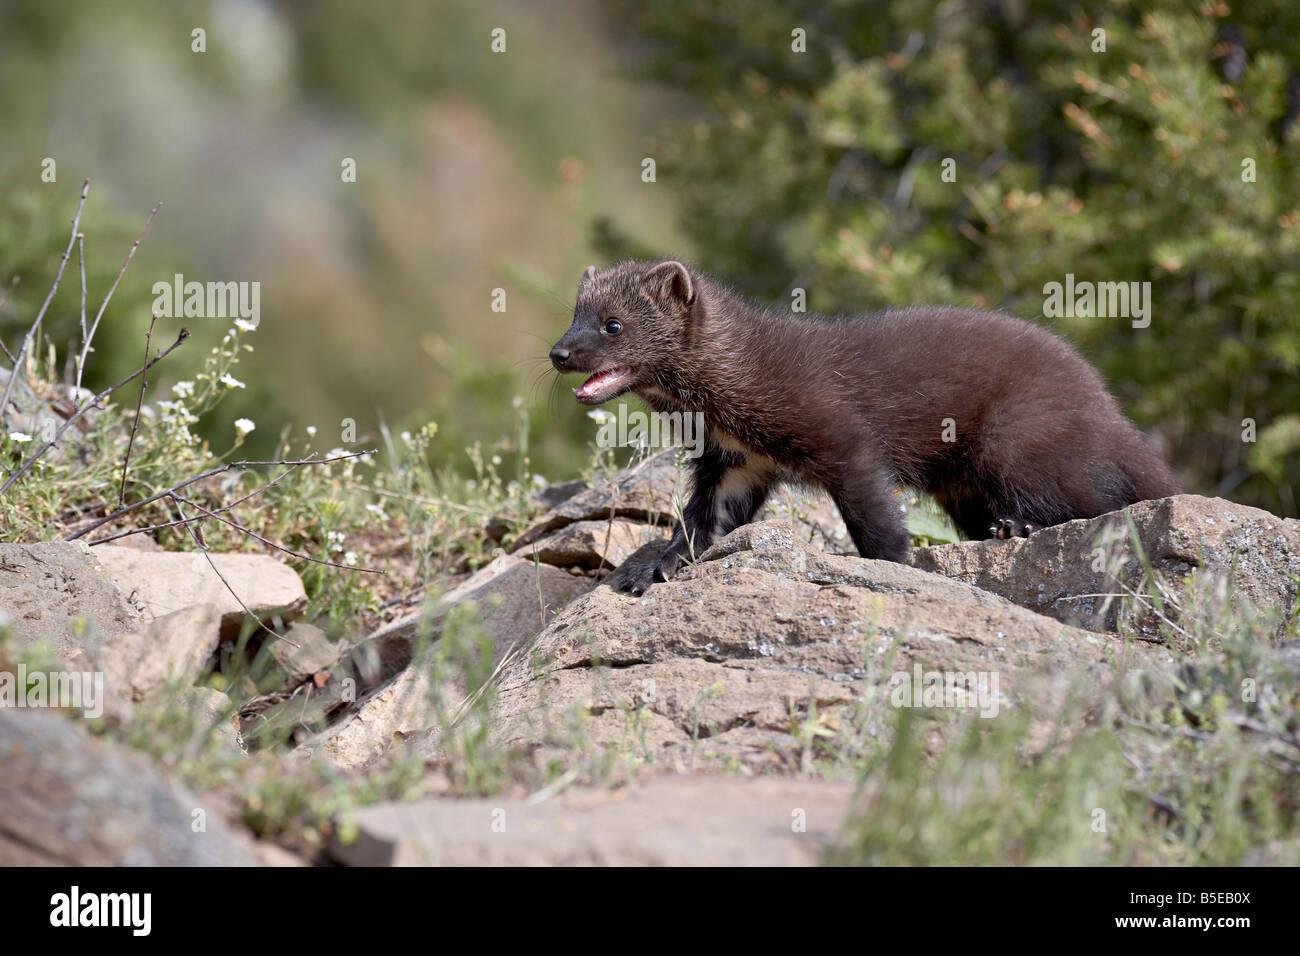 Baby fisher (Martes pennanti) in captivity, Animals of Montana, Bozeman, Montana, USA, North America Stock Photo